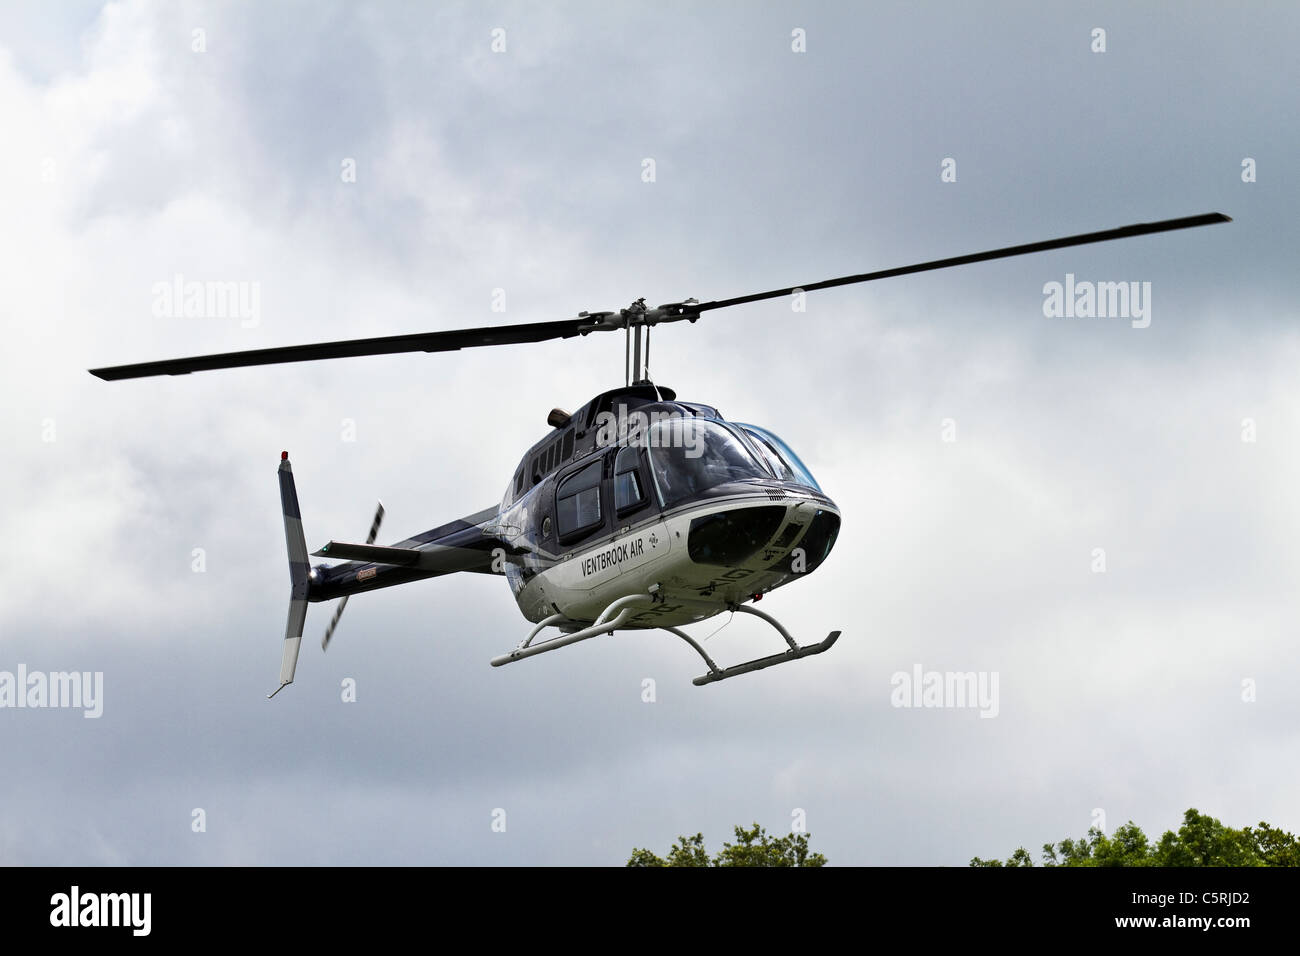 Ventbrook Air_Helicopter Pleasure Cruises at Preston Gala, Lancashire, UK - Stock Image